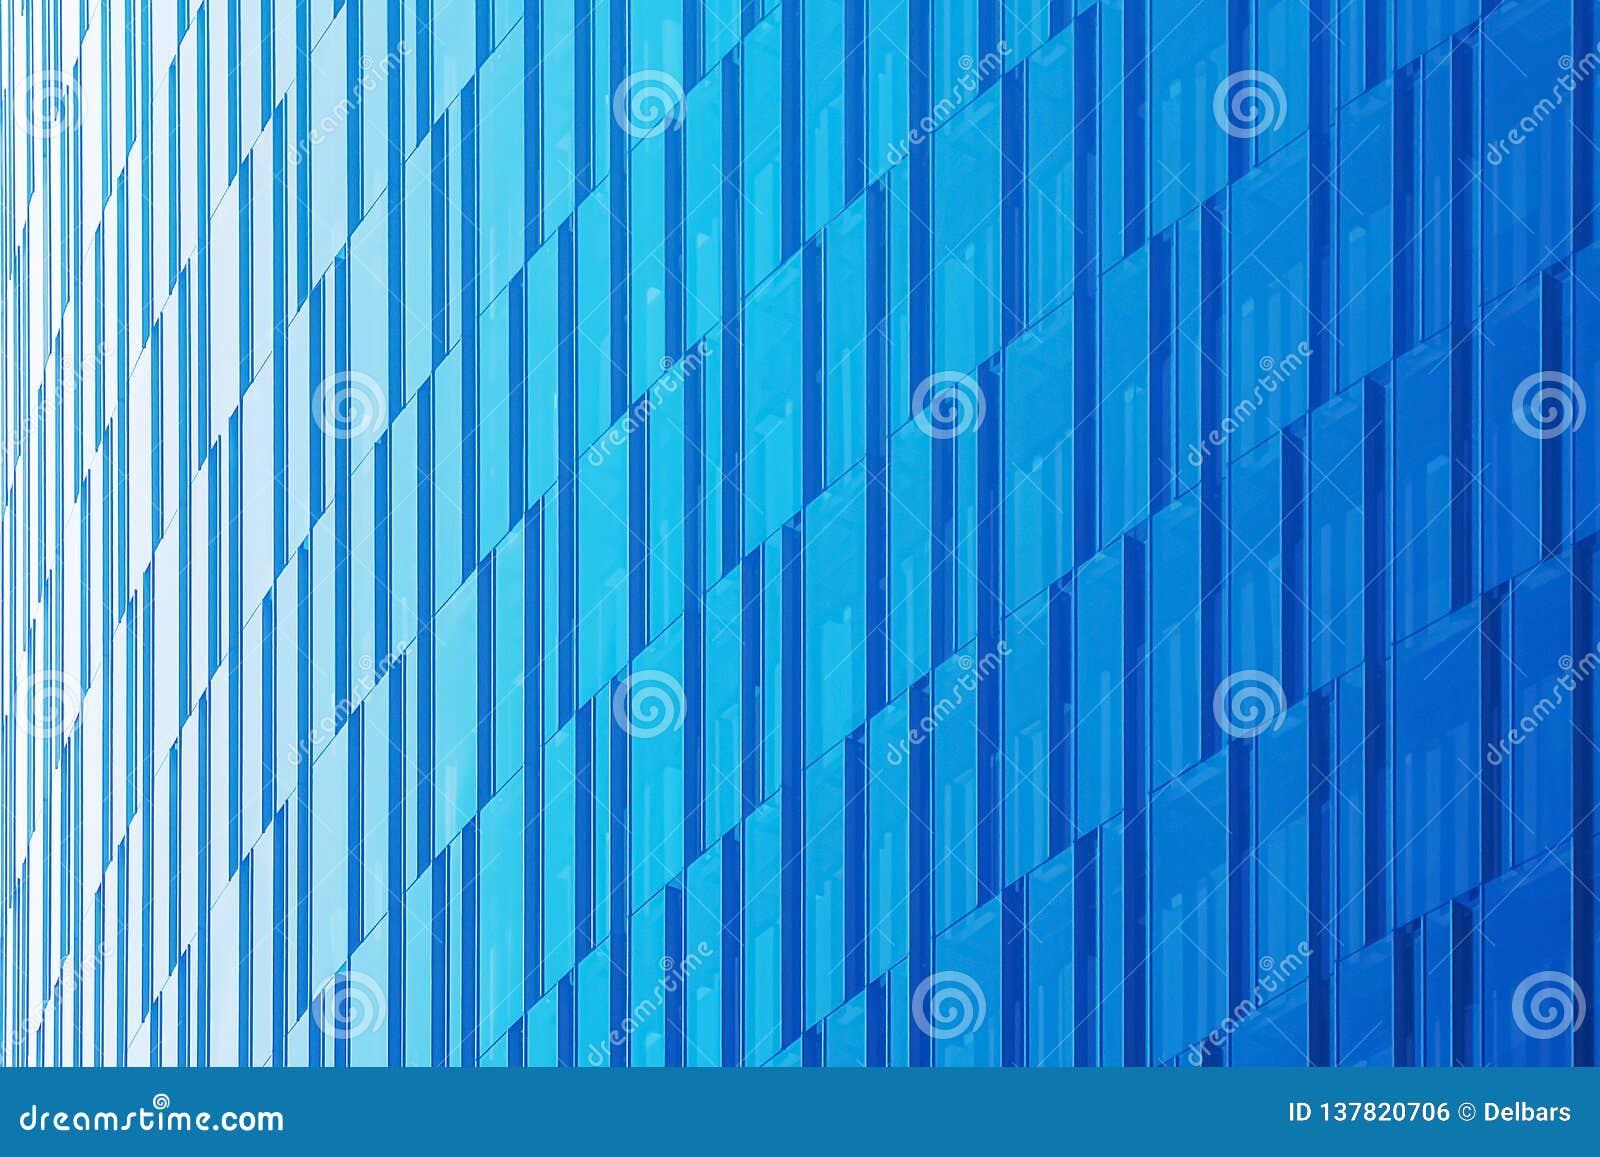 Geometric architectural urban background in blue tones. The glass facade of a skyscraper.